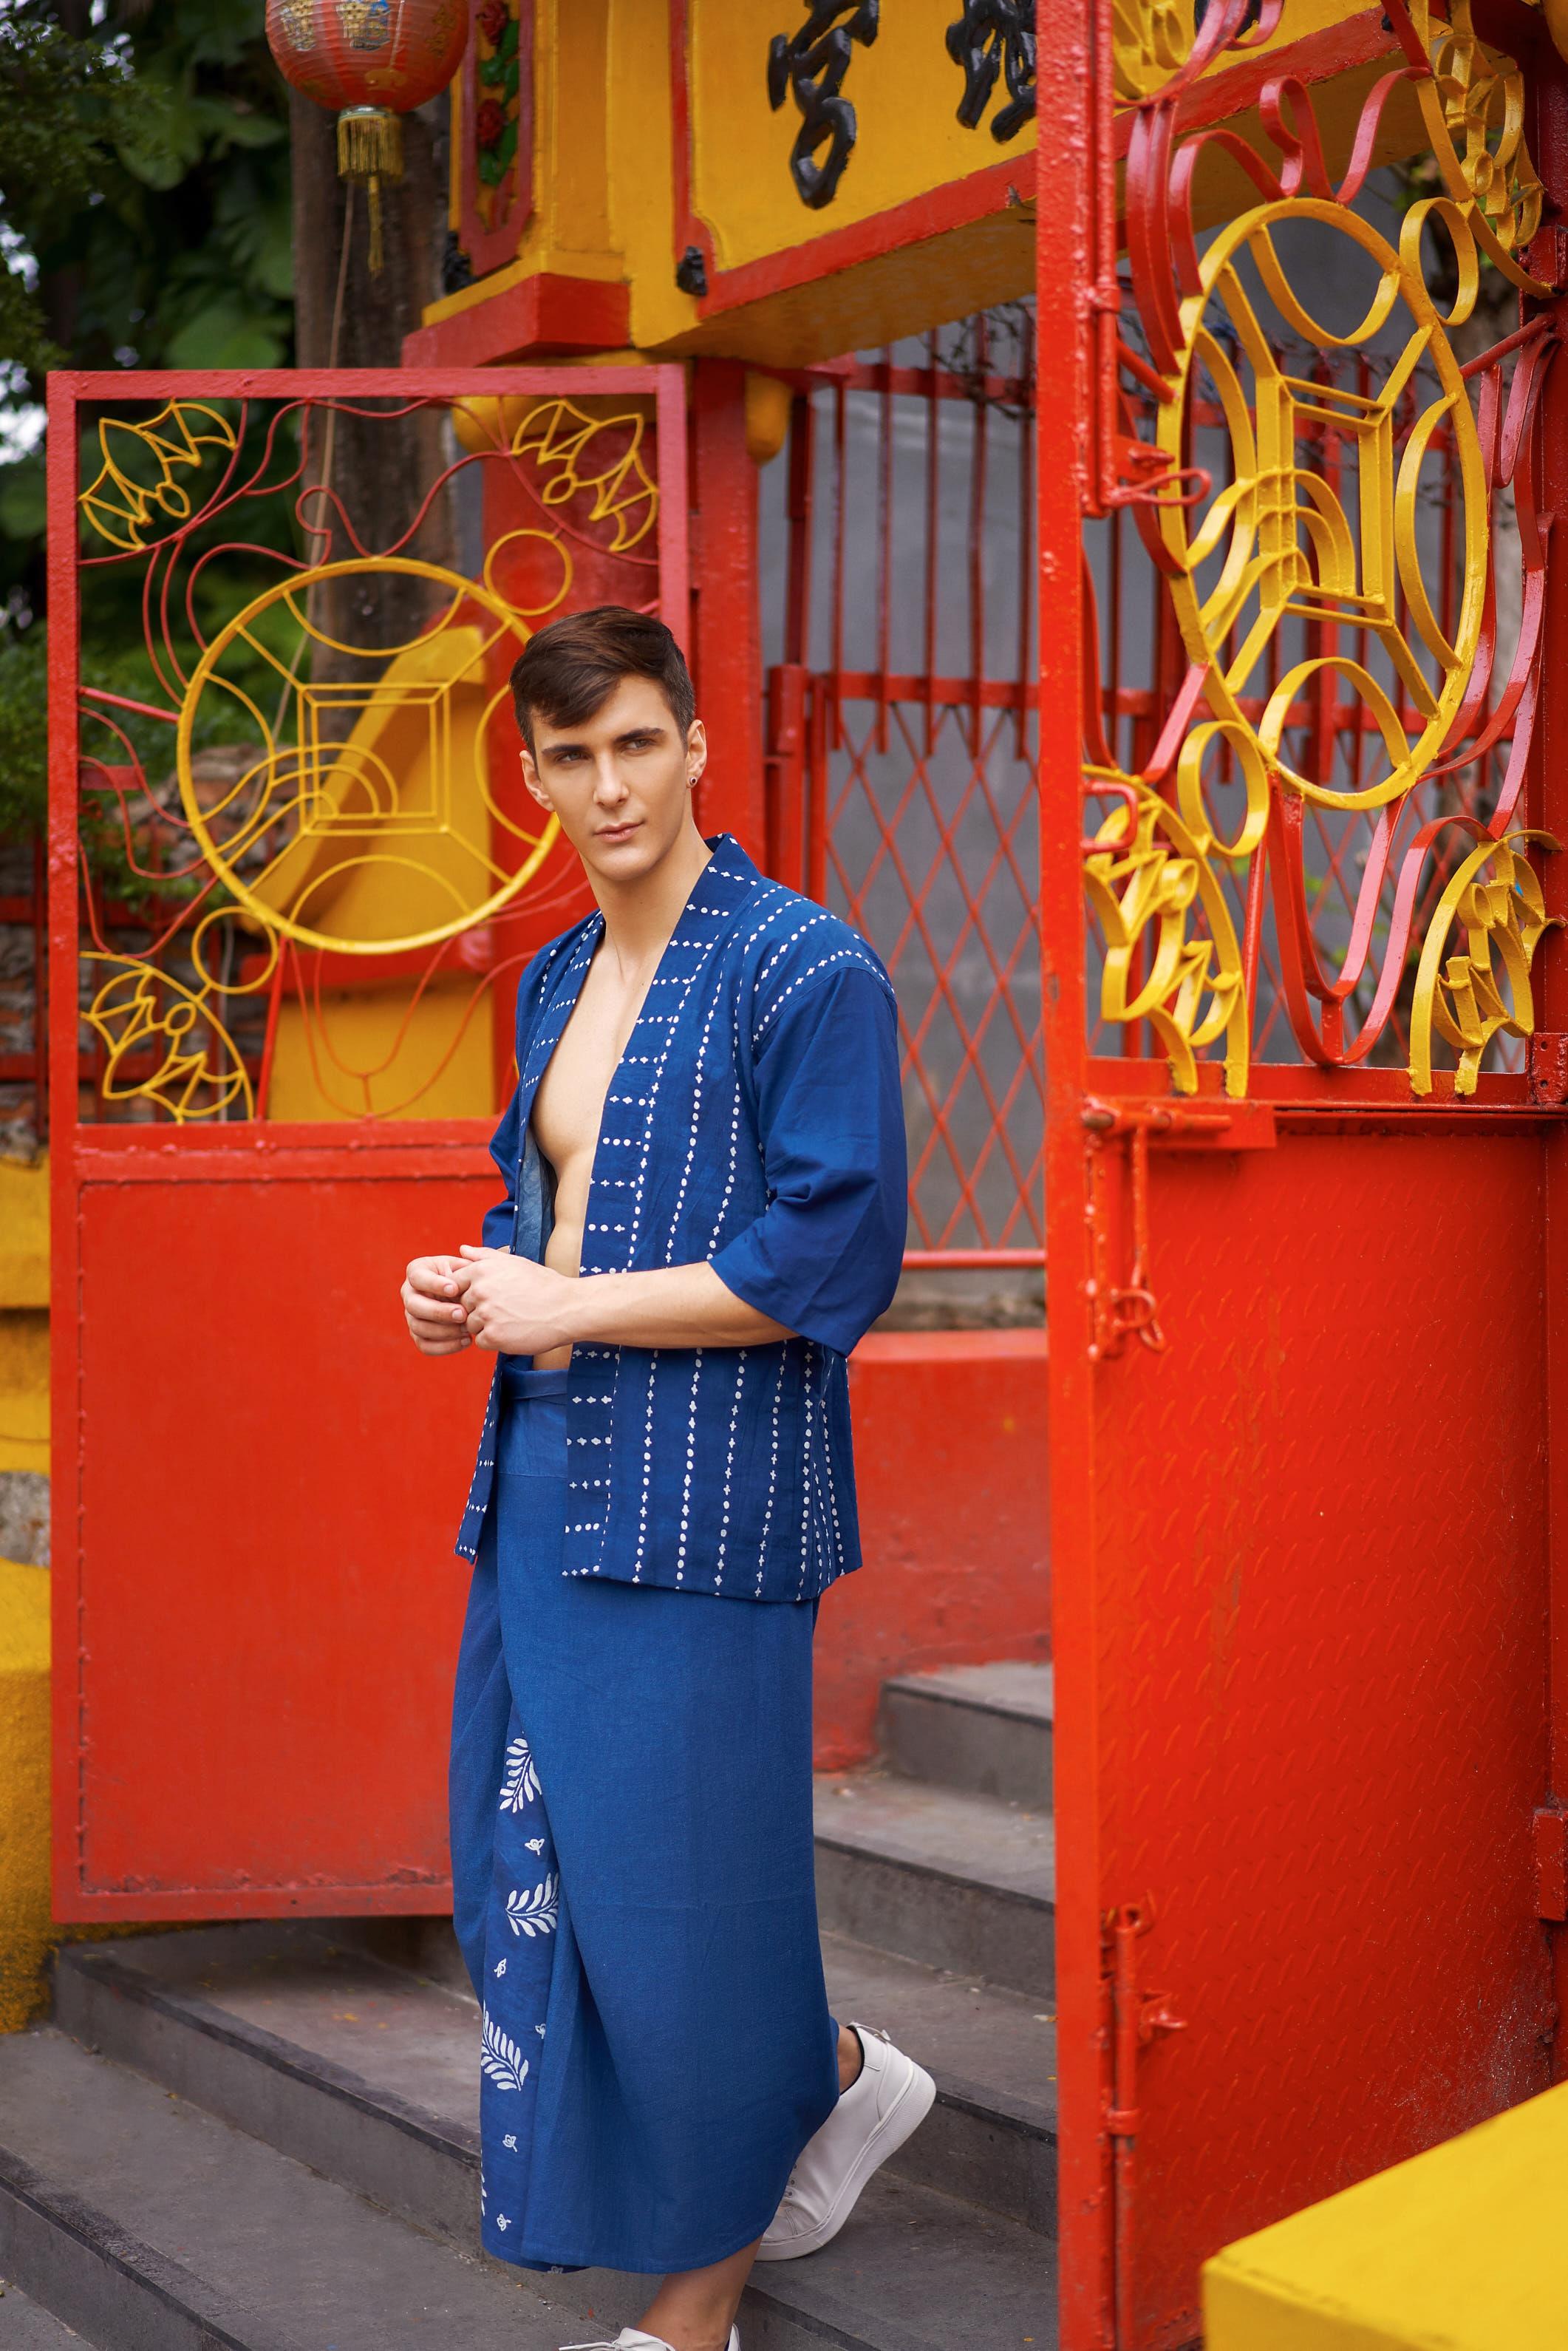 THE SHONET Fashion Editorial